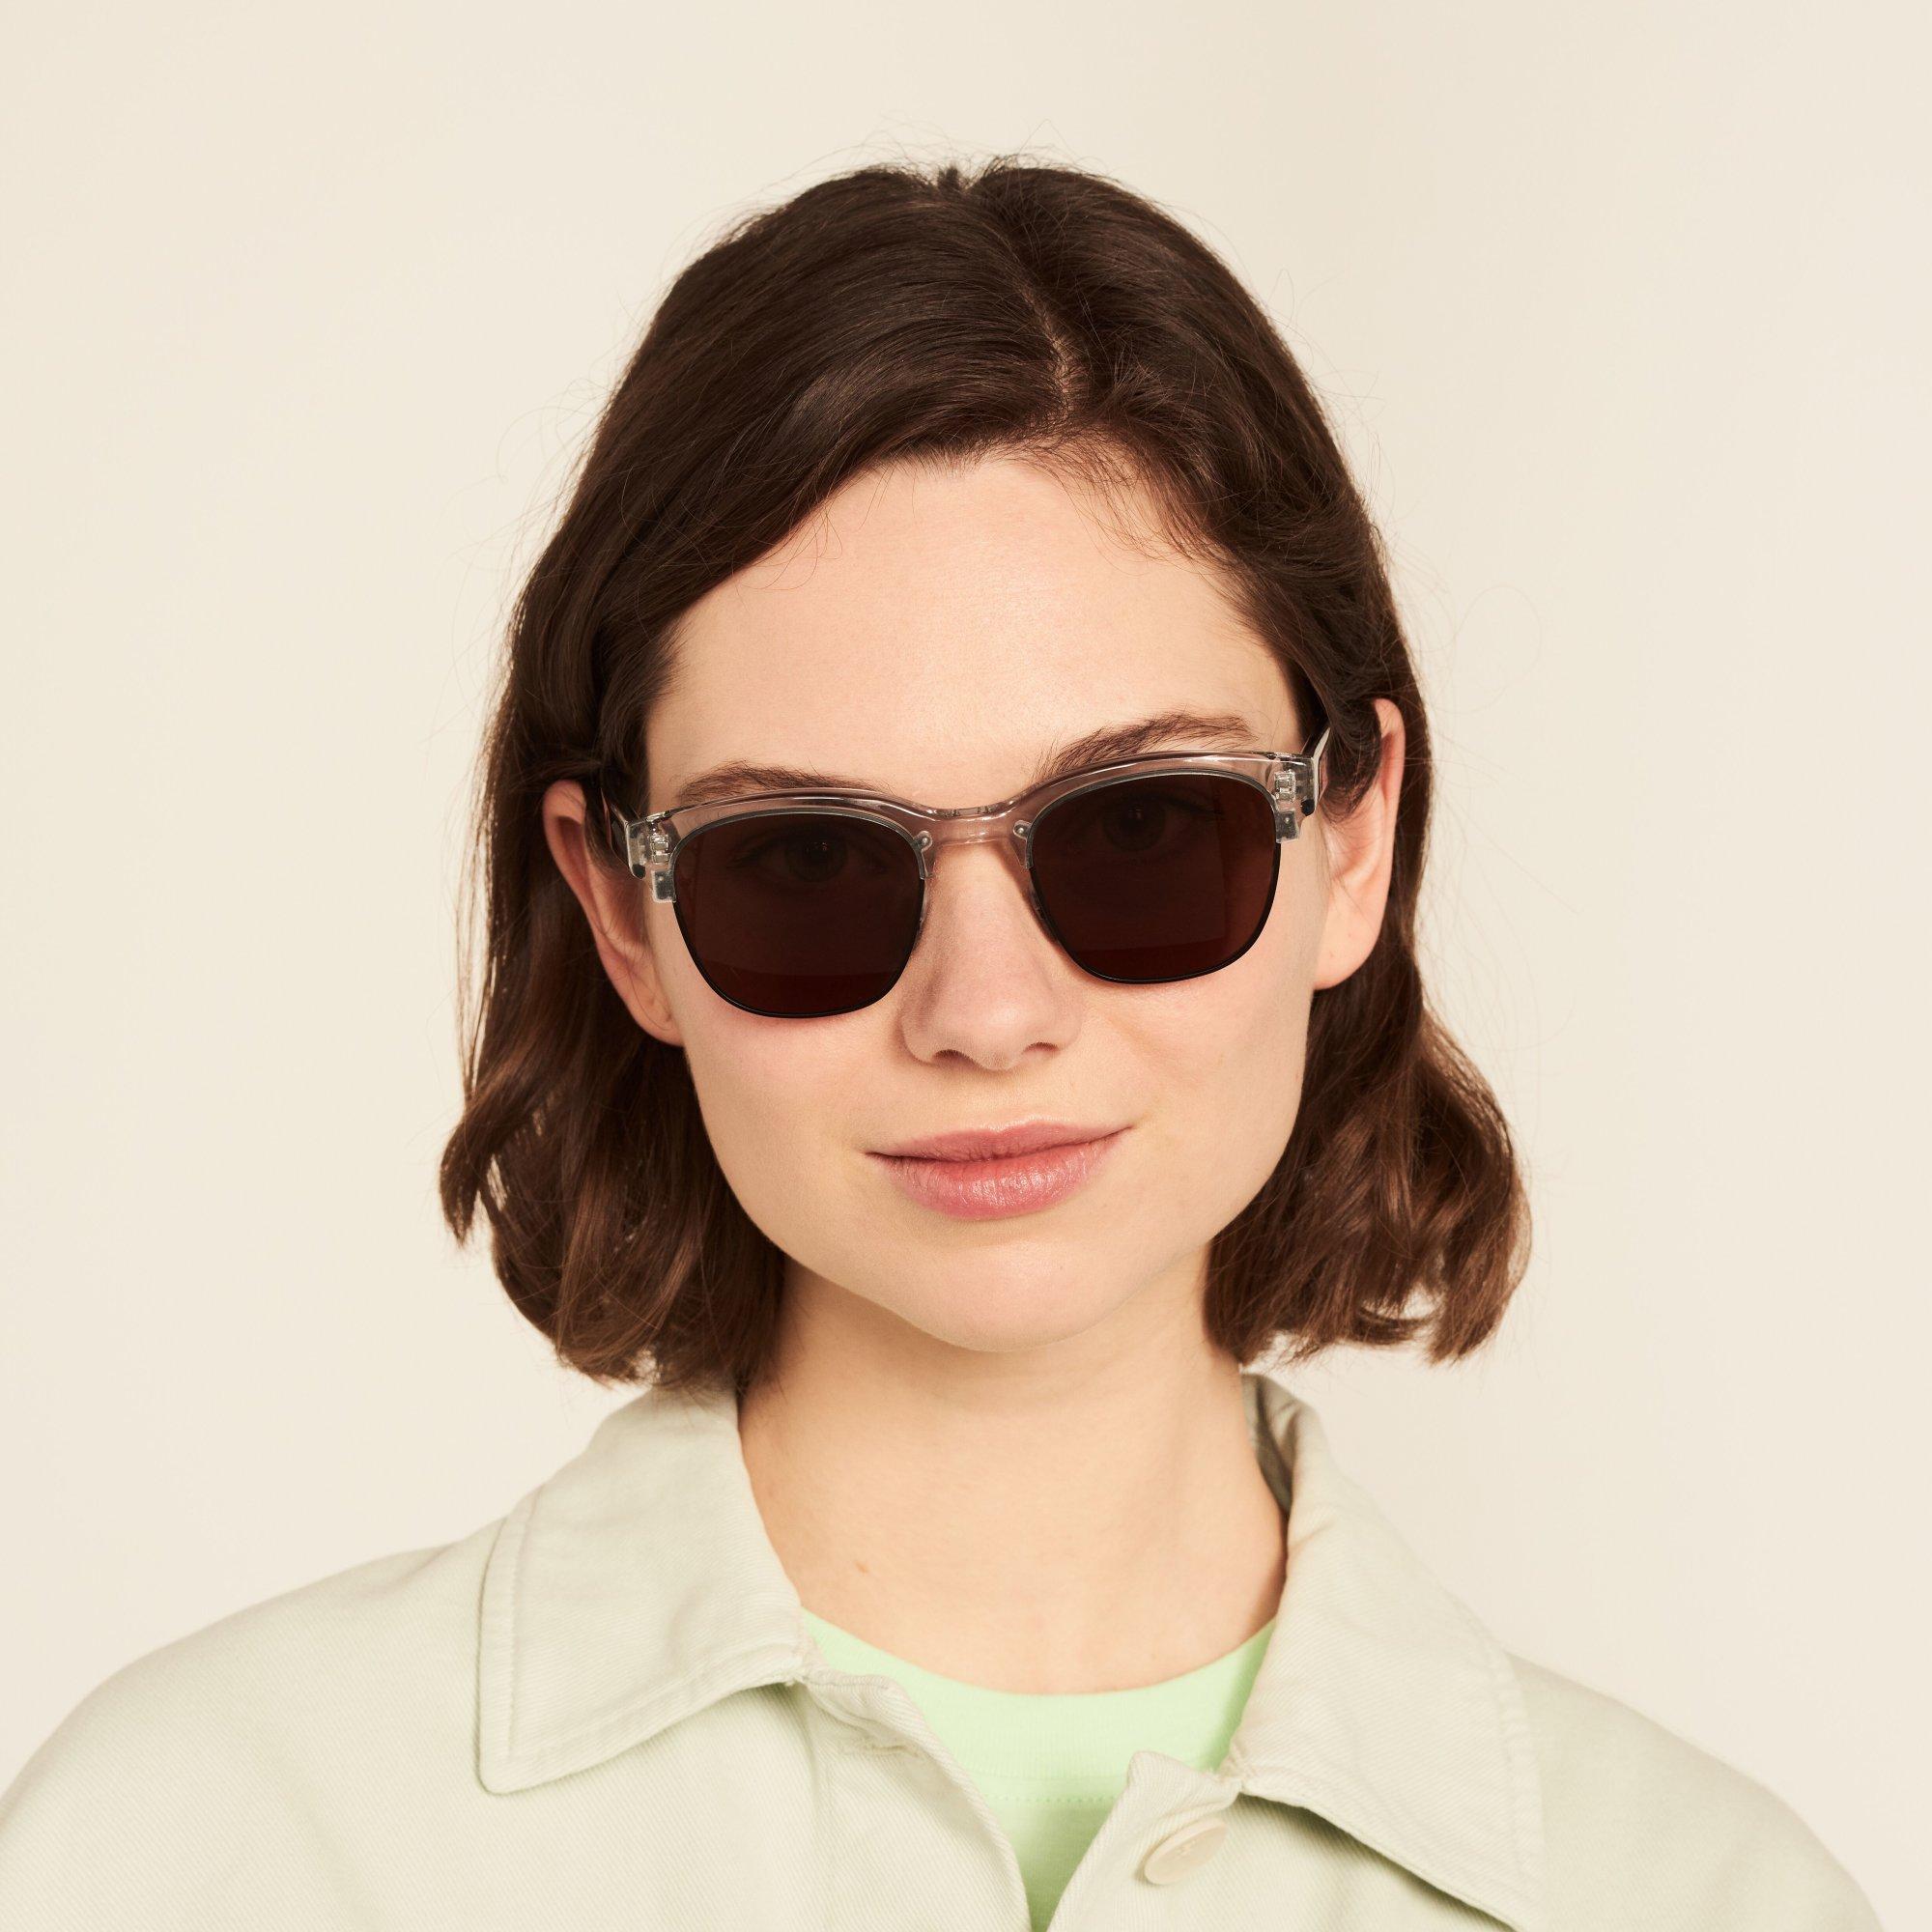 Ace & Tate Sunglasses | quadratisch Metall in Schwarz, Transparent, Grau